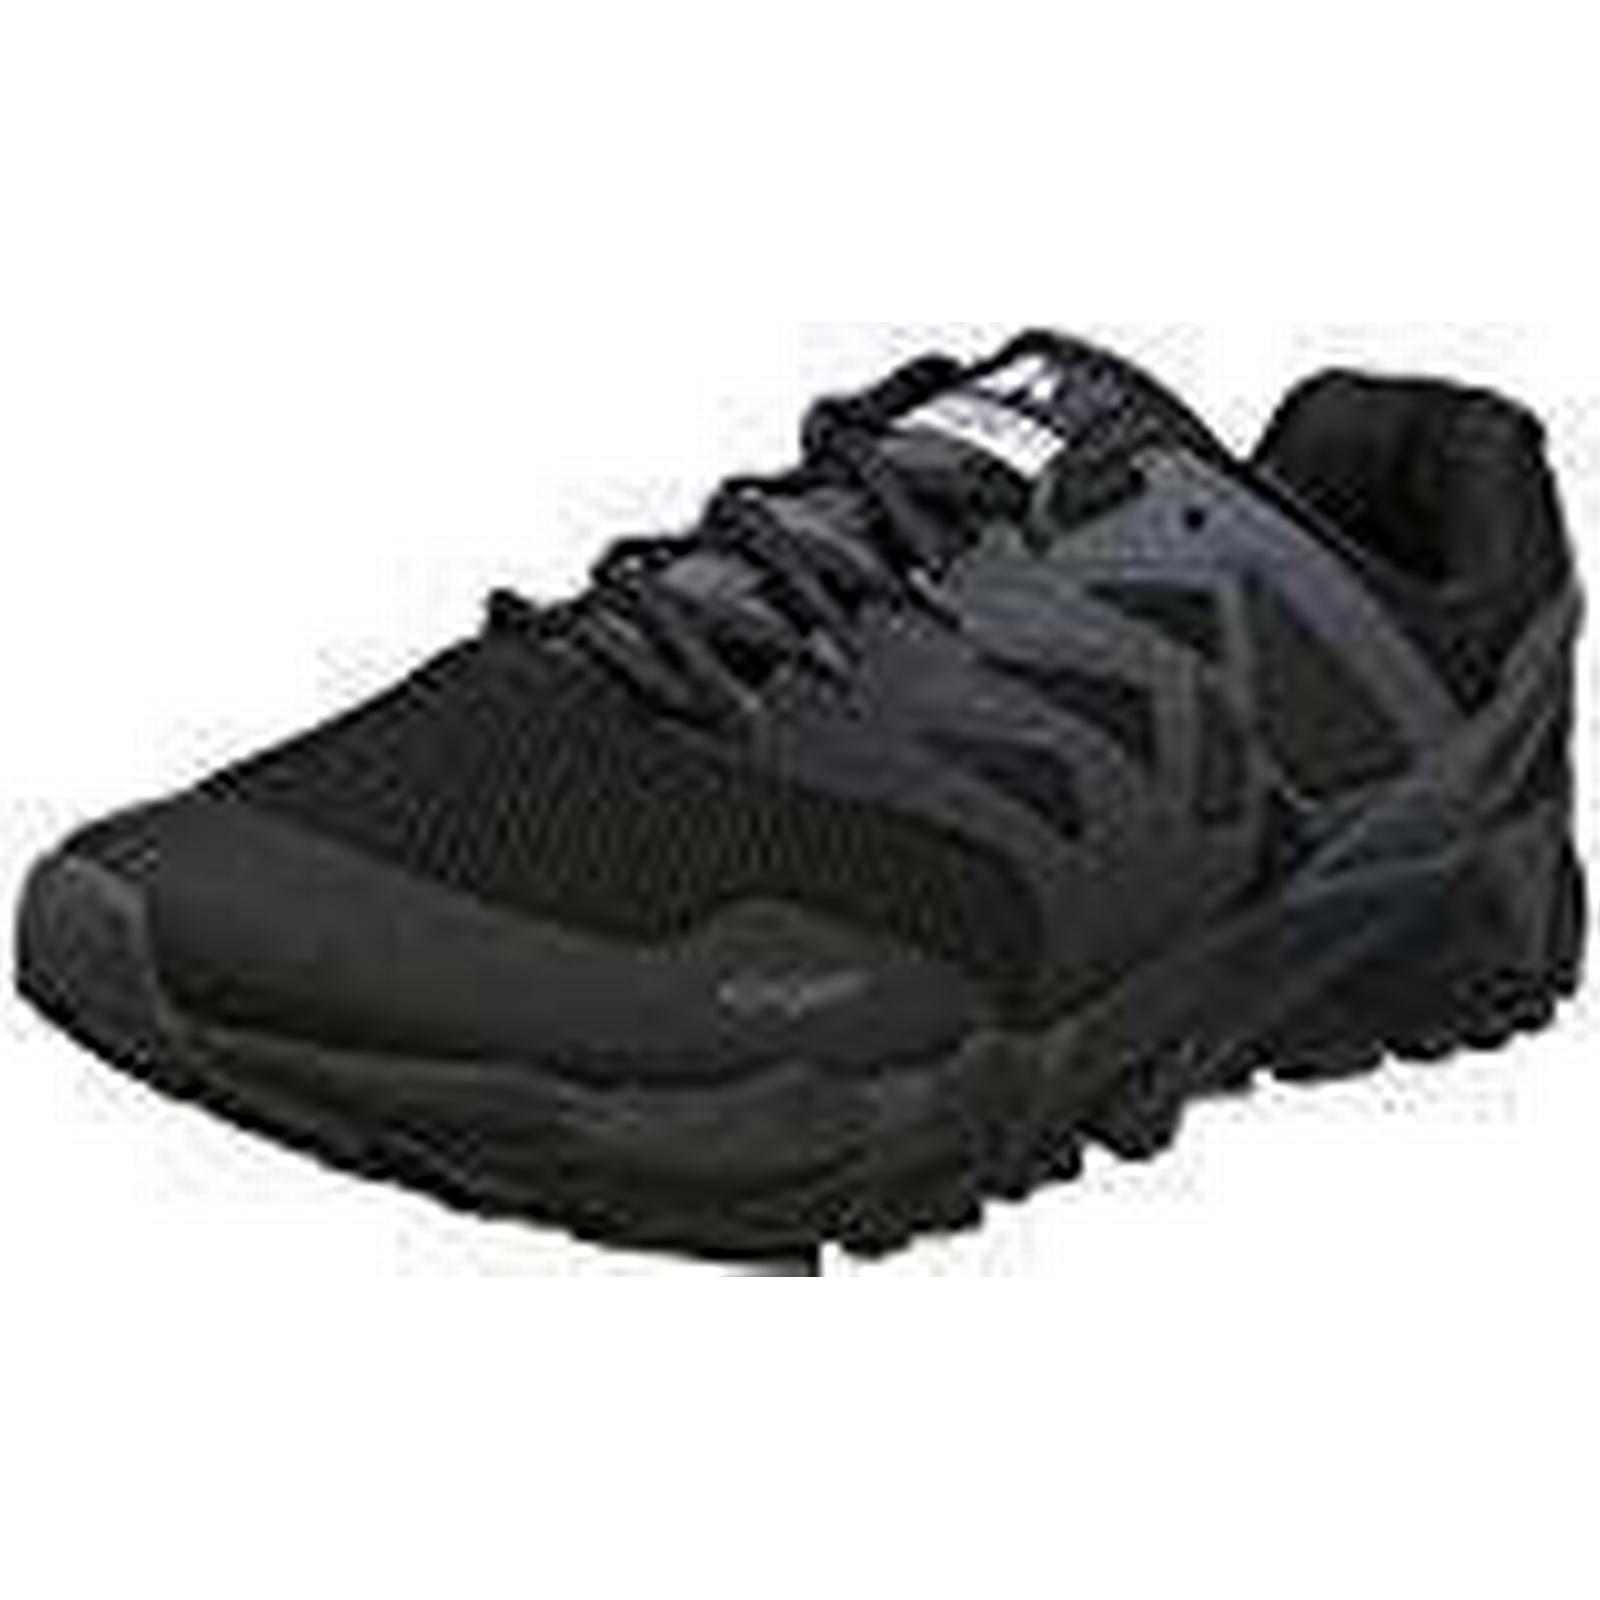 Merrell Men's Agility Peak Flex 2 Black GTX Trail Running Shoes, Black 2 (Black Black), 13 49 EU 9078ee